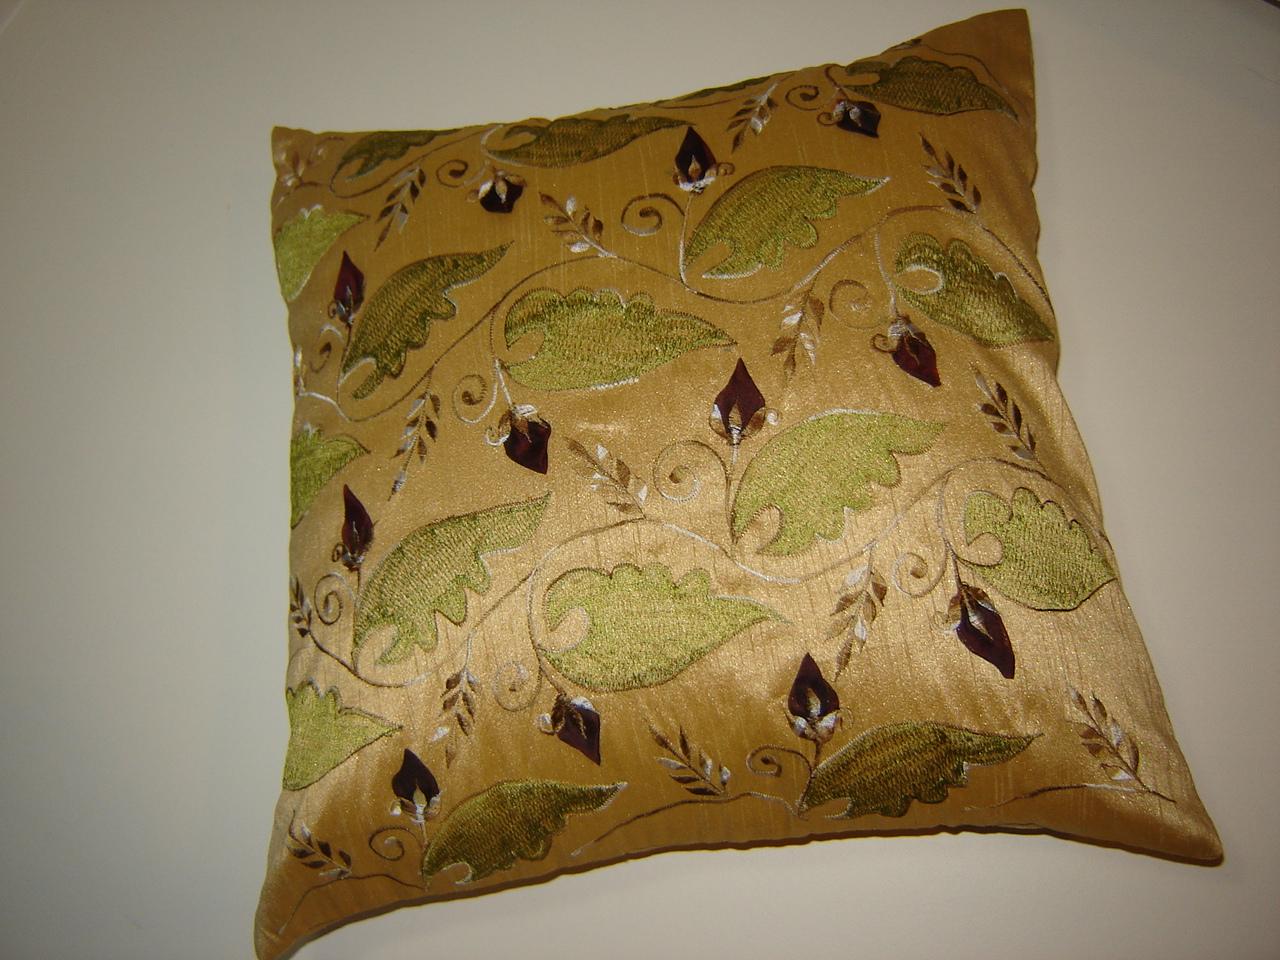 Outdoor Floor Cushions Designs of Home and Garden